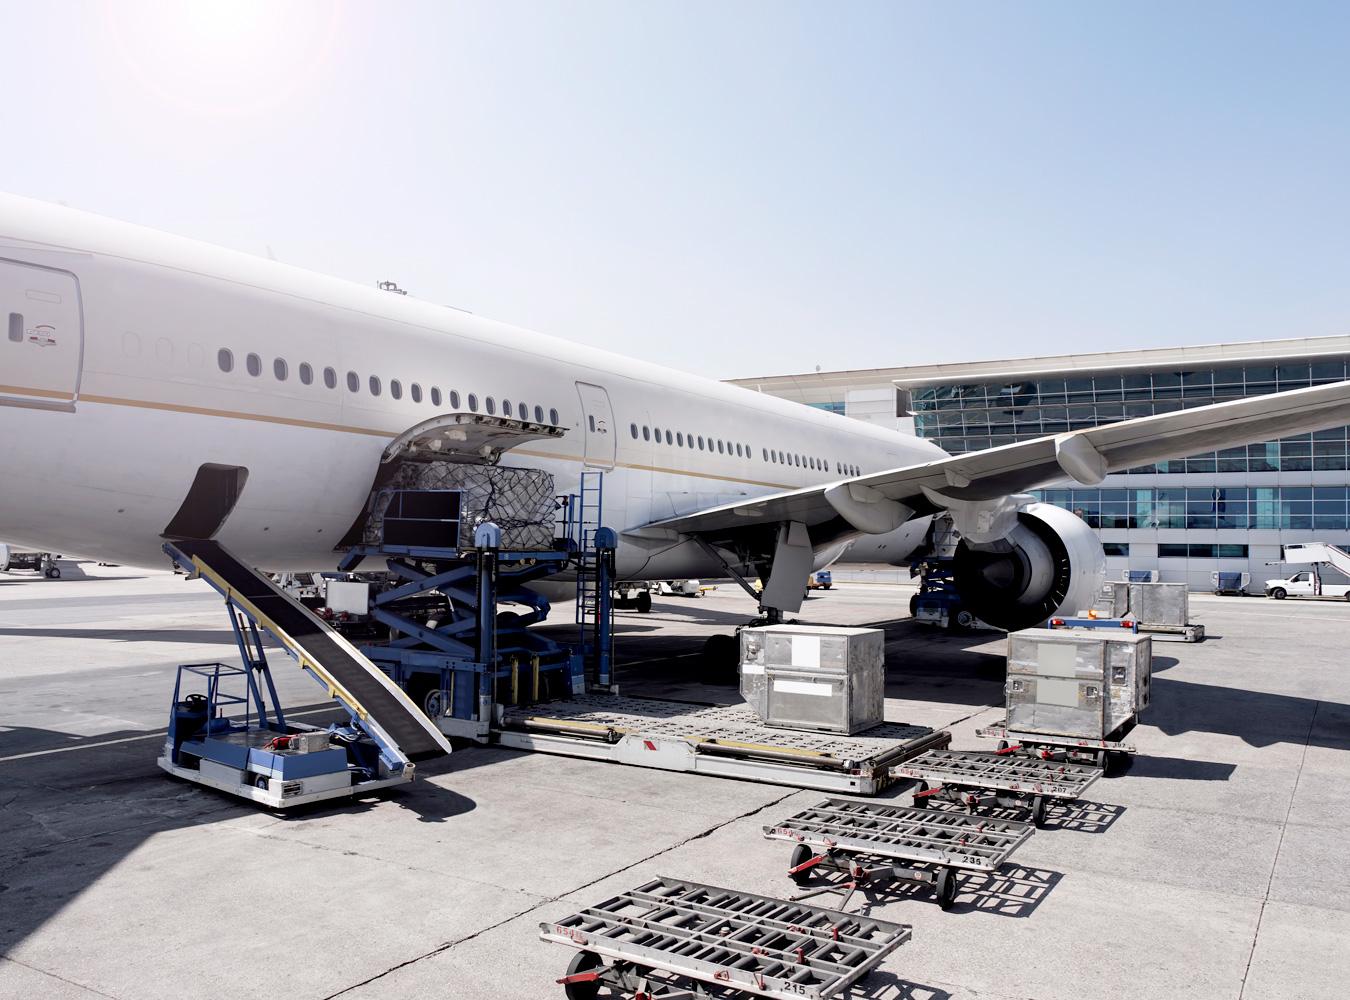 Logistics 4 Pharma - Service - Pharma-logistics - Cargo; Cargo is transported into the aircraft